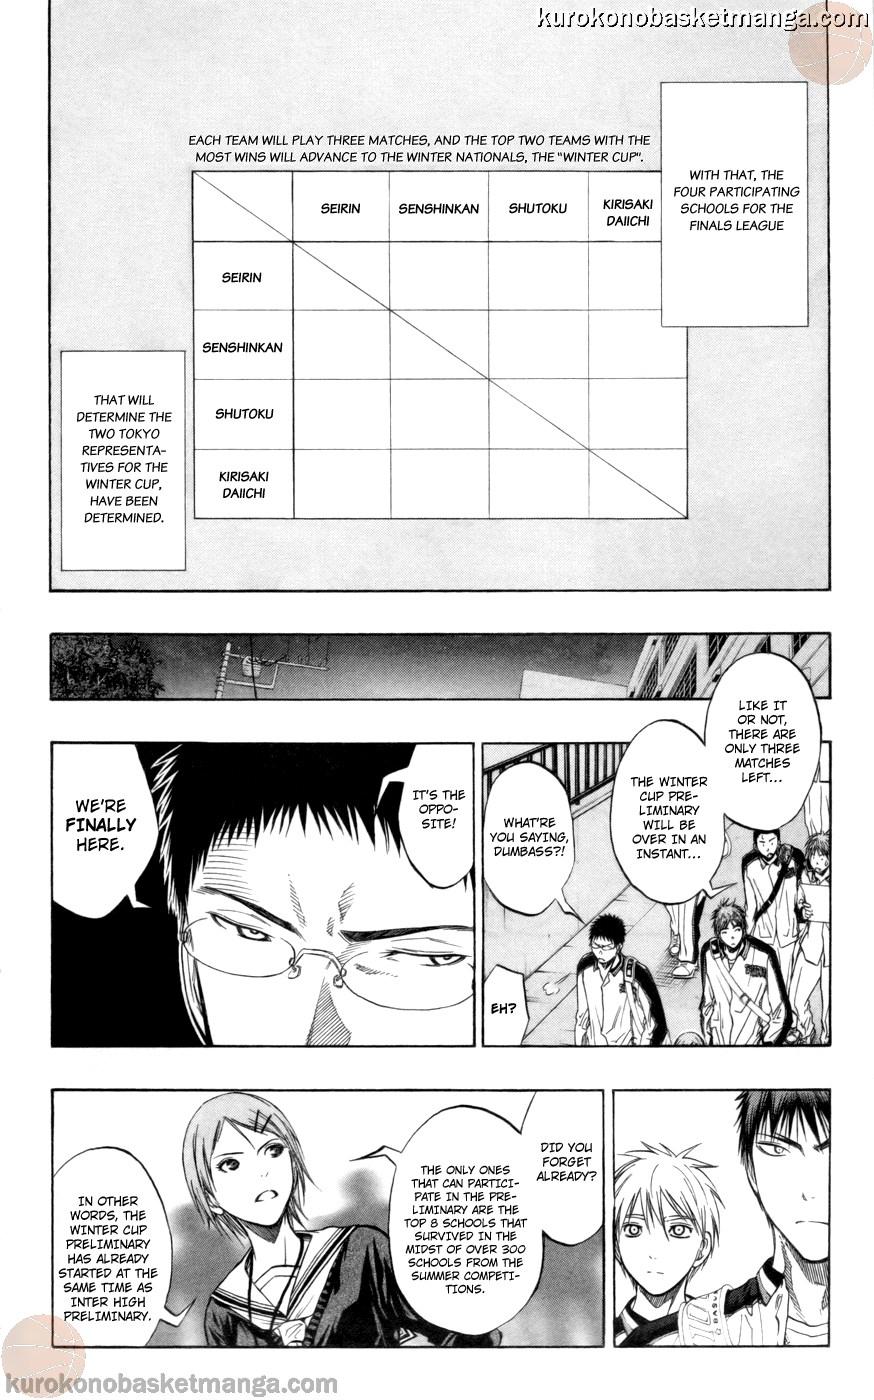 Kuroko no Basket Manga Chapter 84 - Image 04